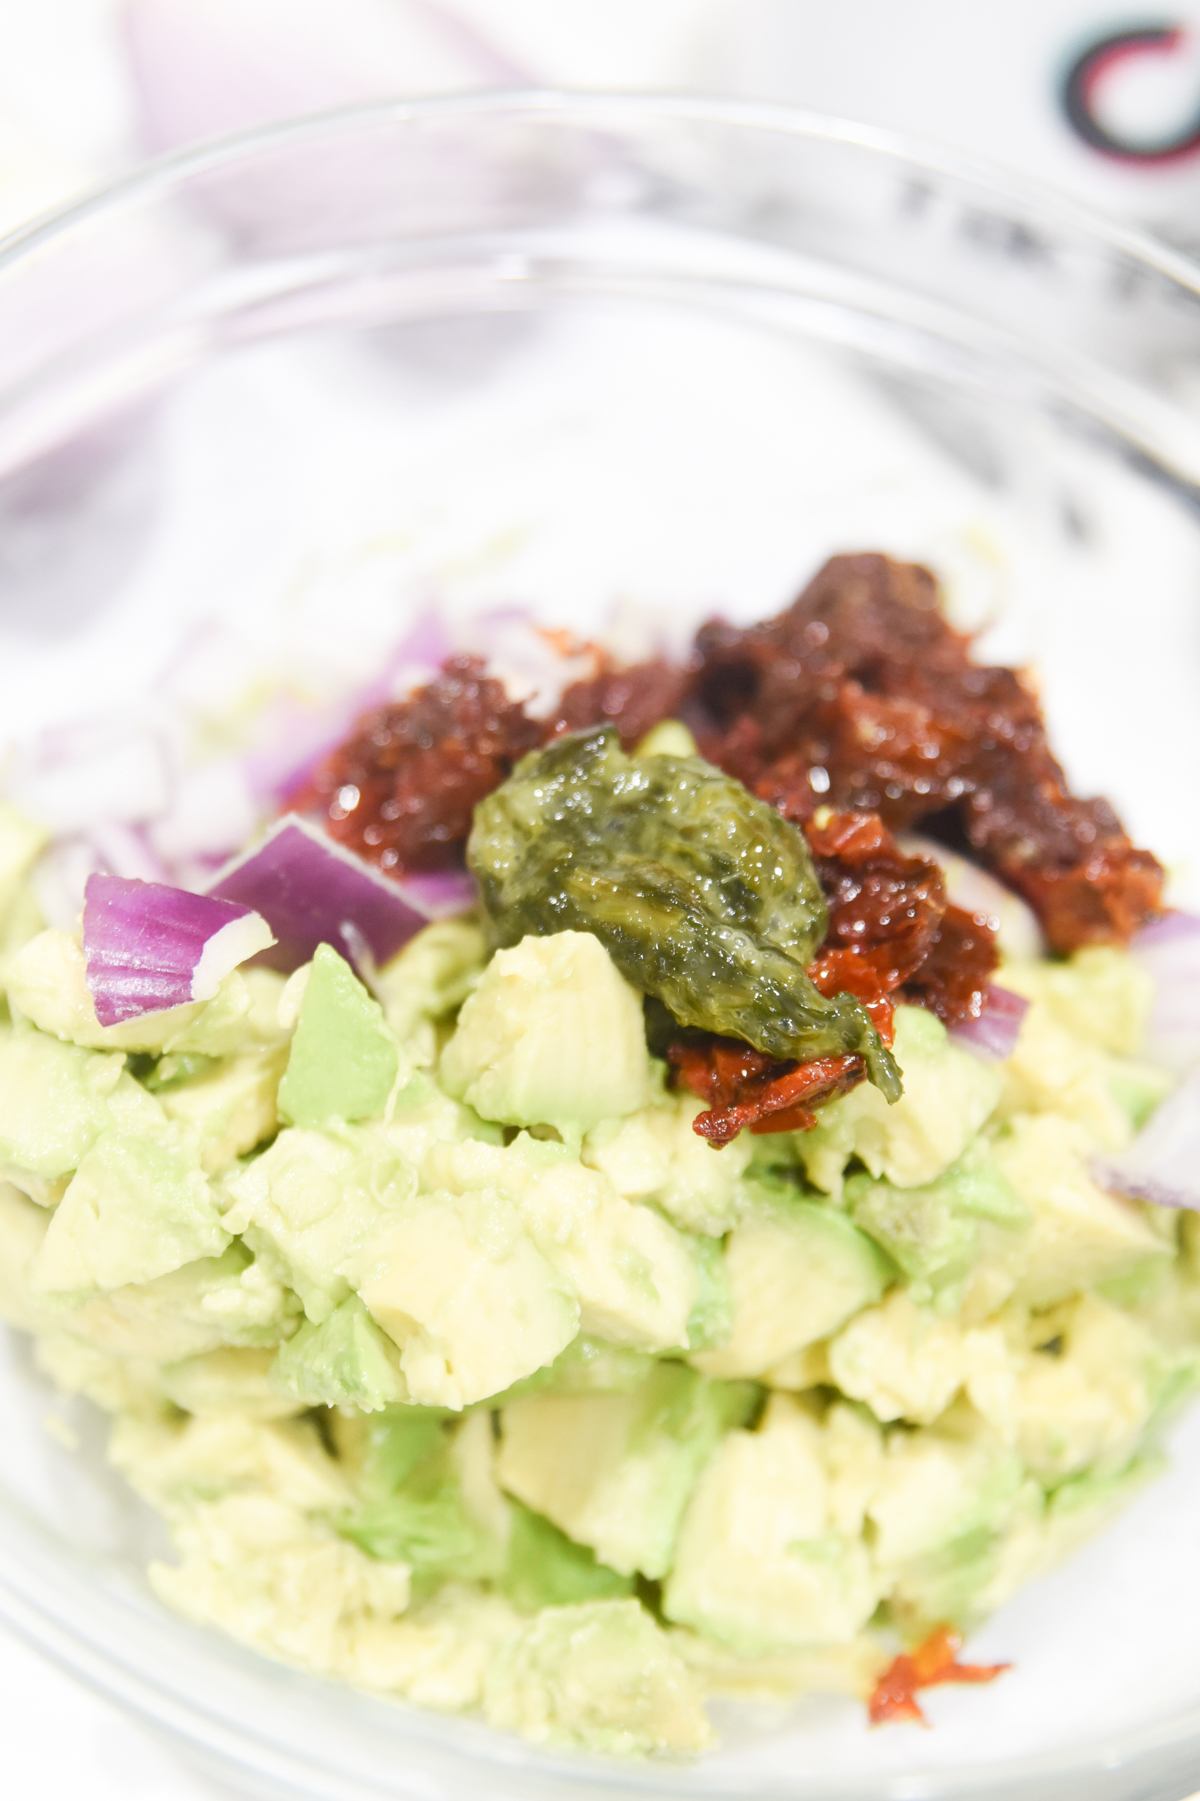 ingredients for avocado egg rolls